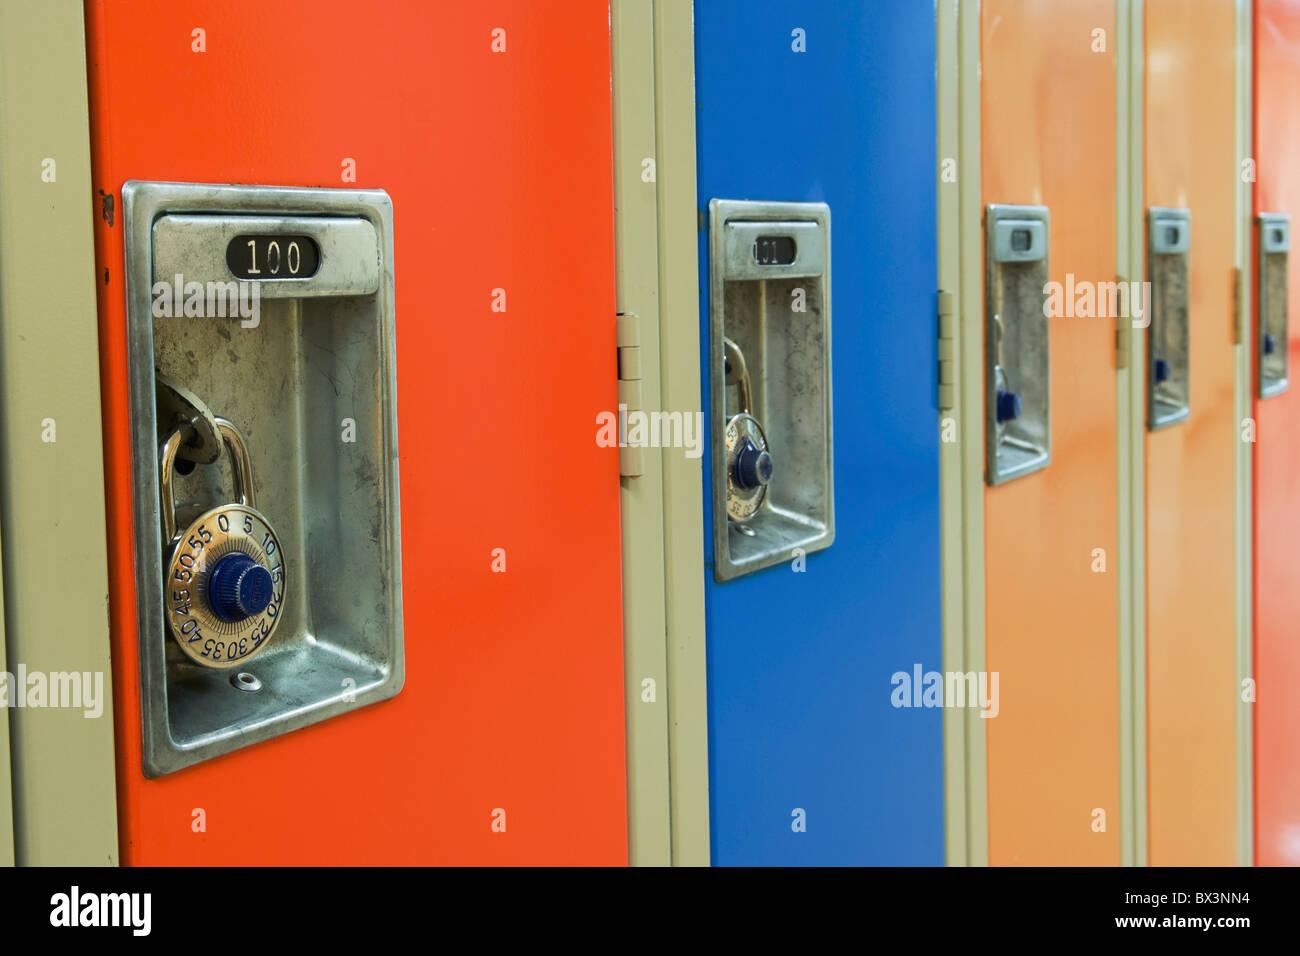 Combination Locks On A Row Of Lockers - Stock Image